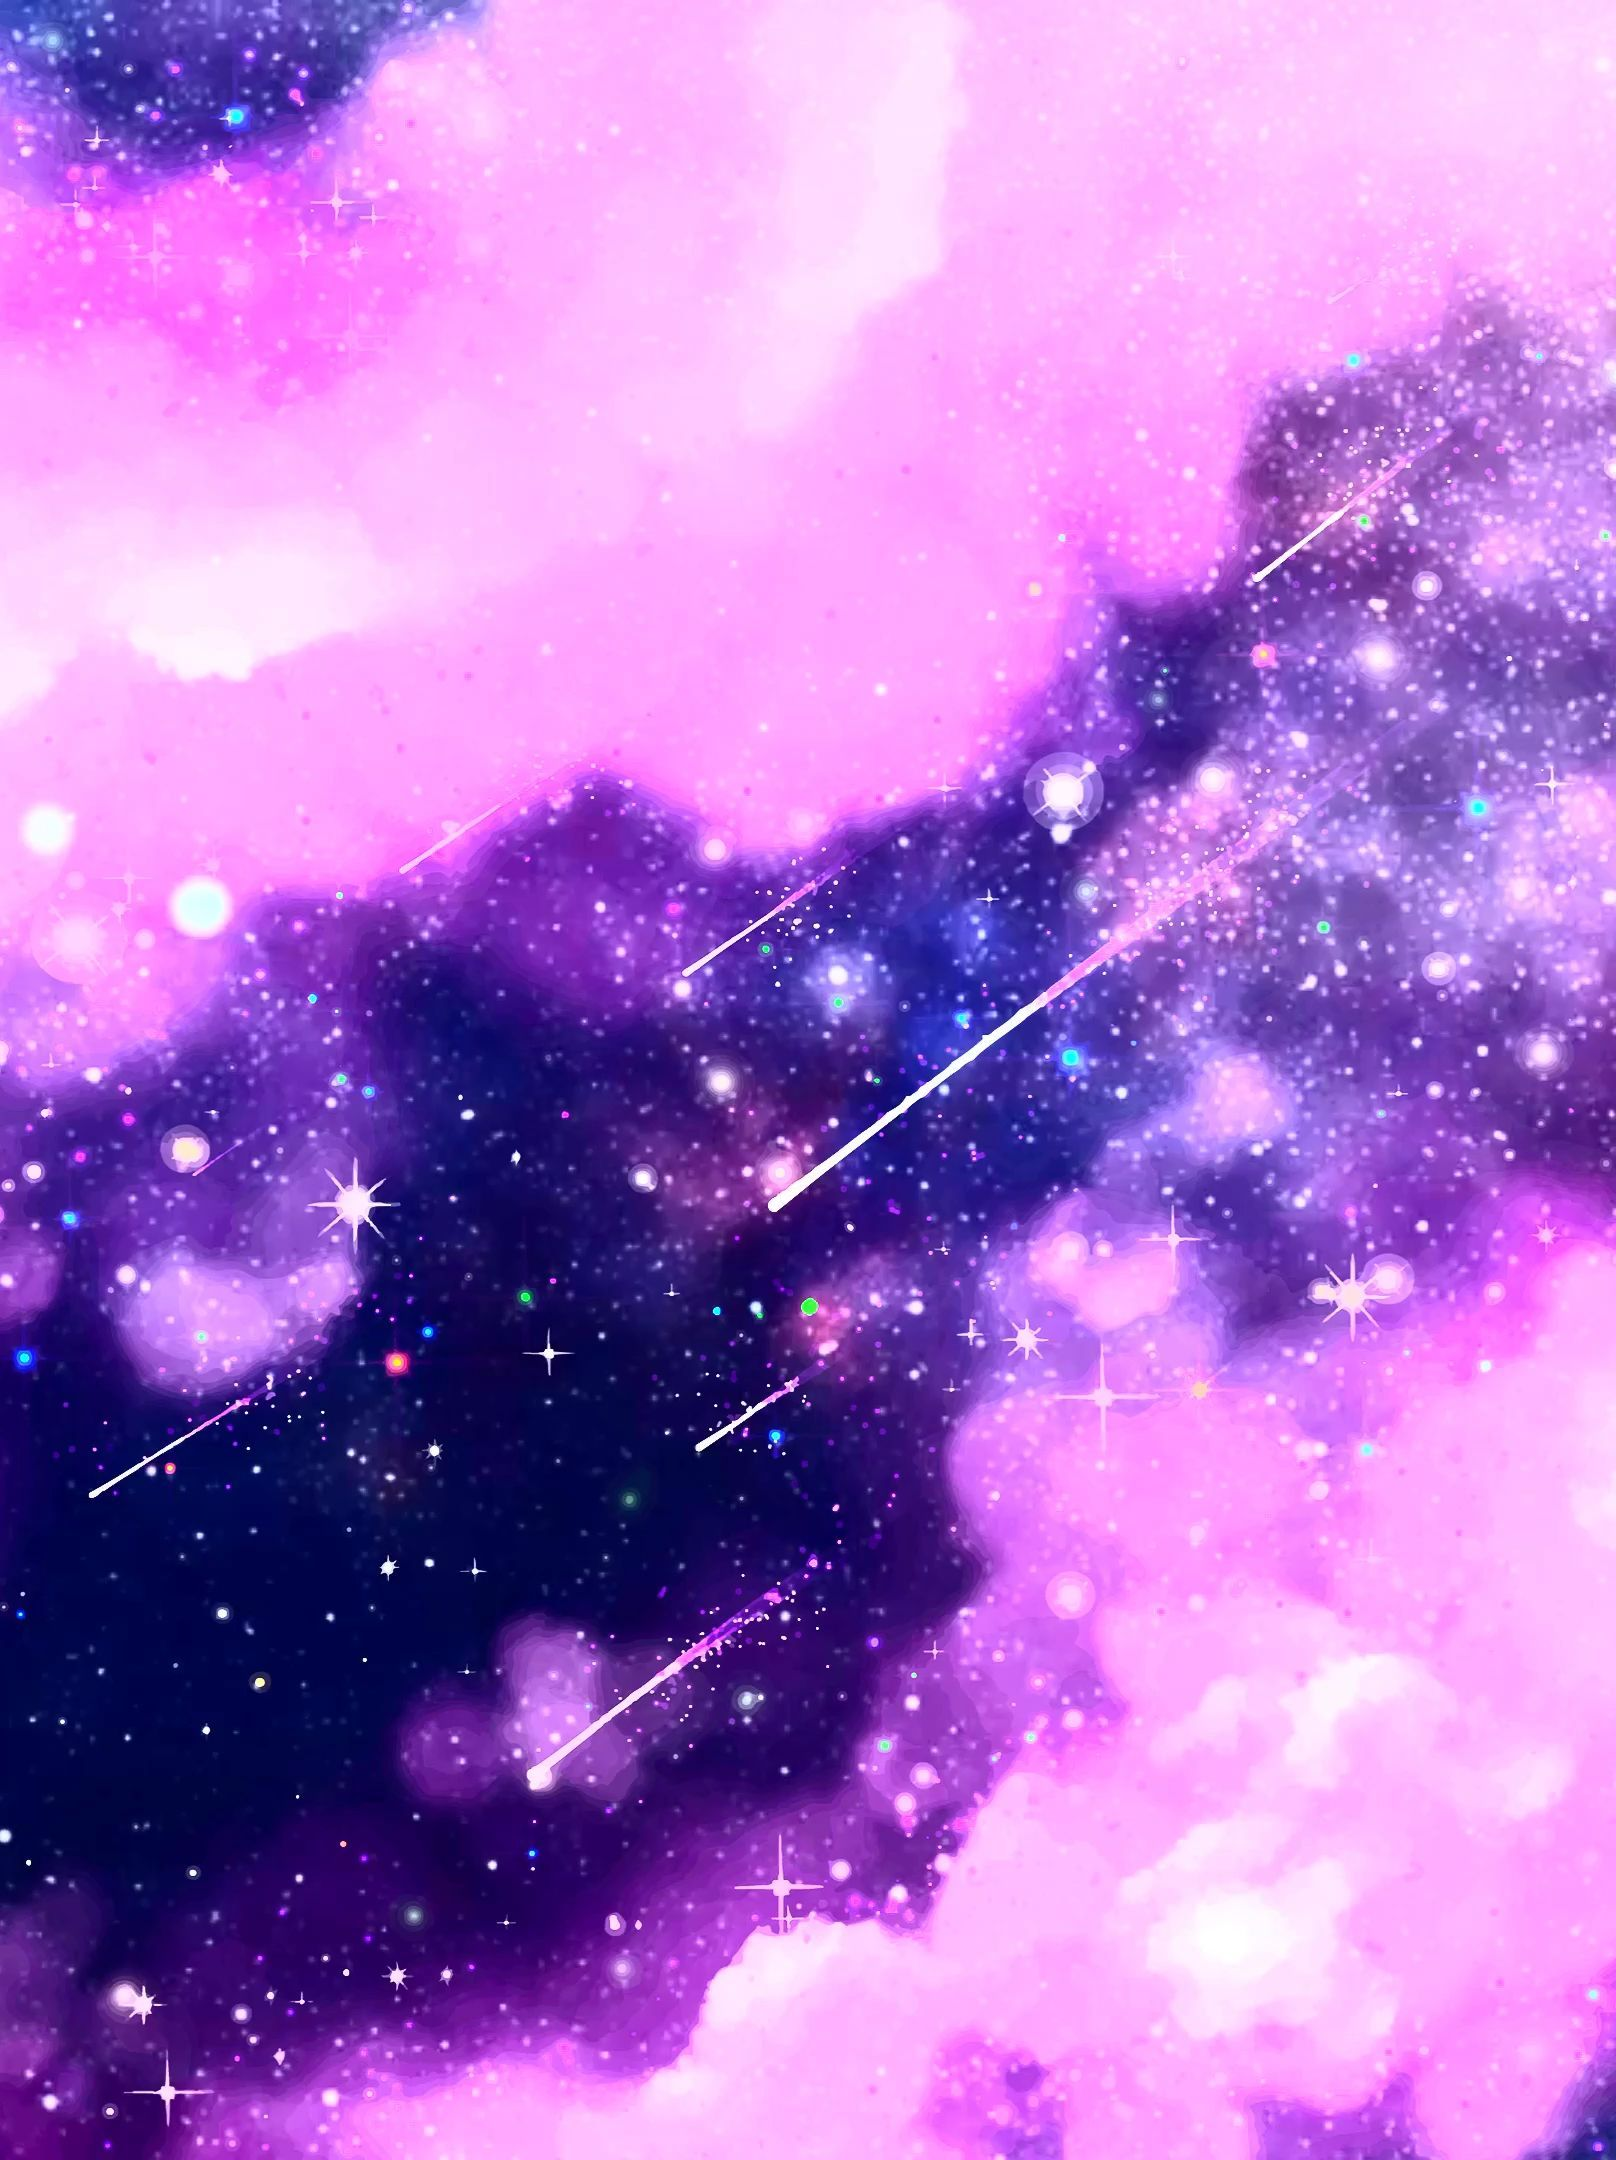 Galaxy Wallpapers Purple Galaxy Wallpaper Iphone Wallpaper Landscape Aesthetic Galaxy